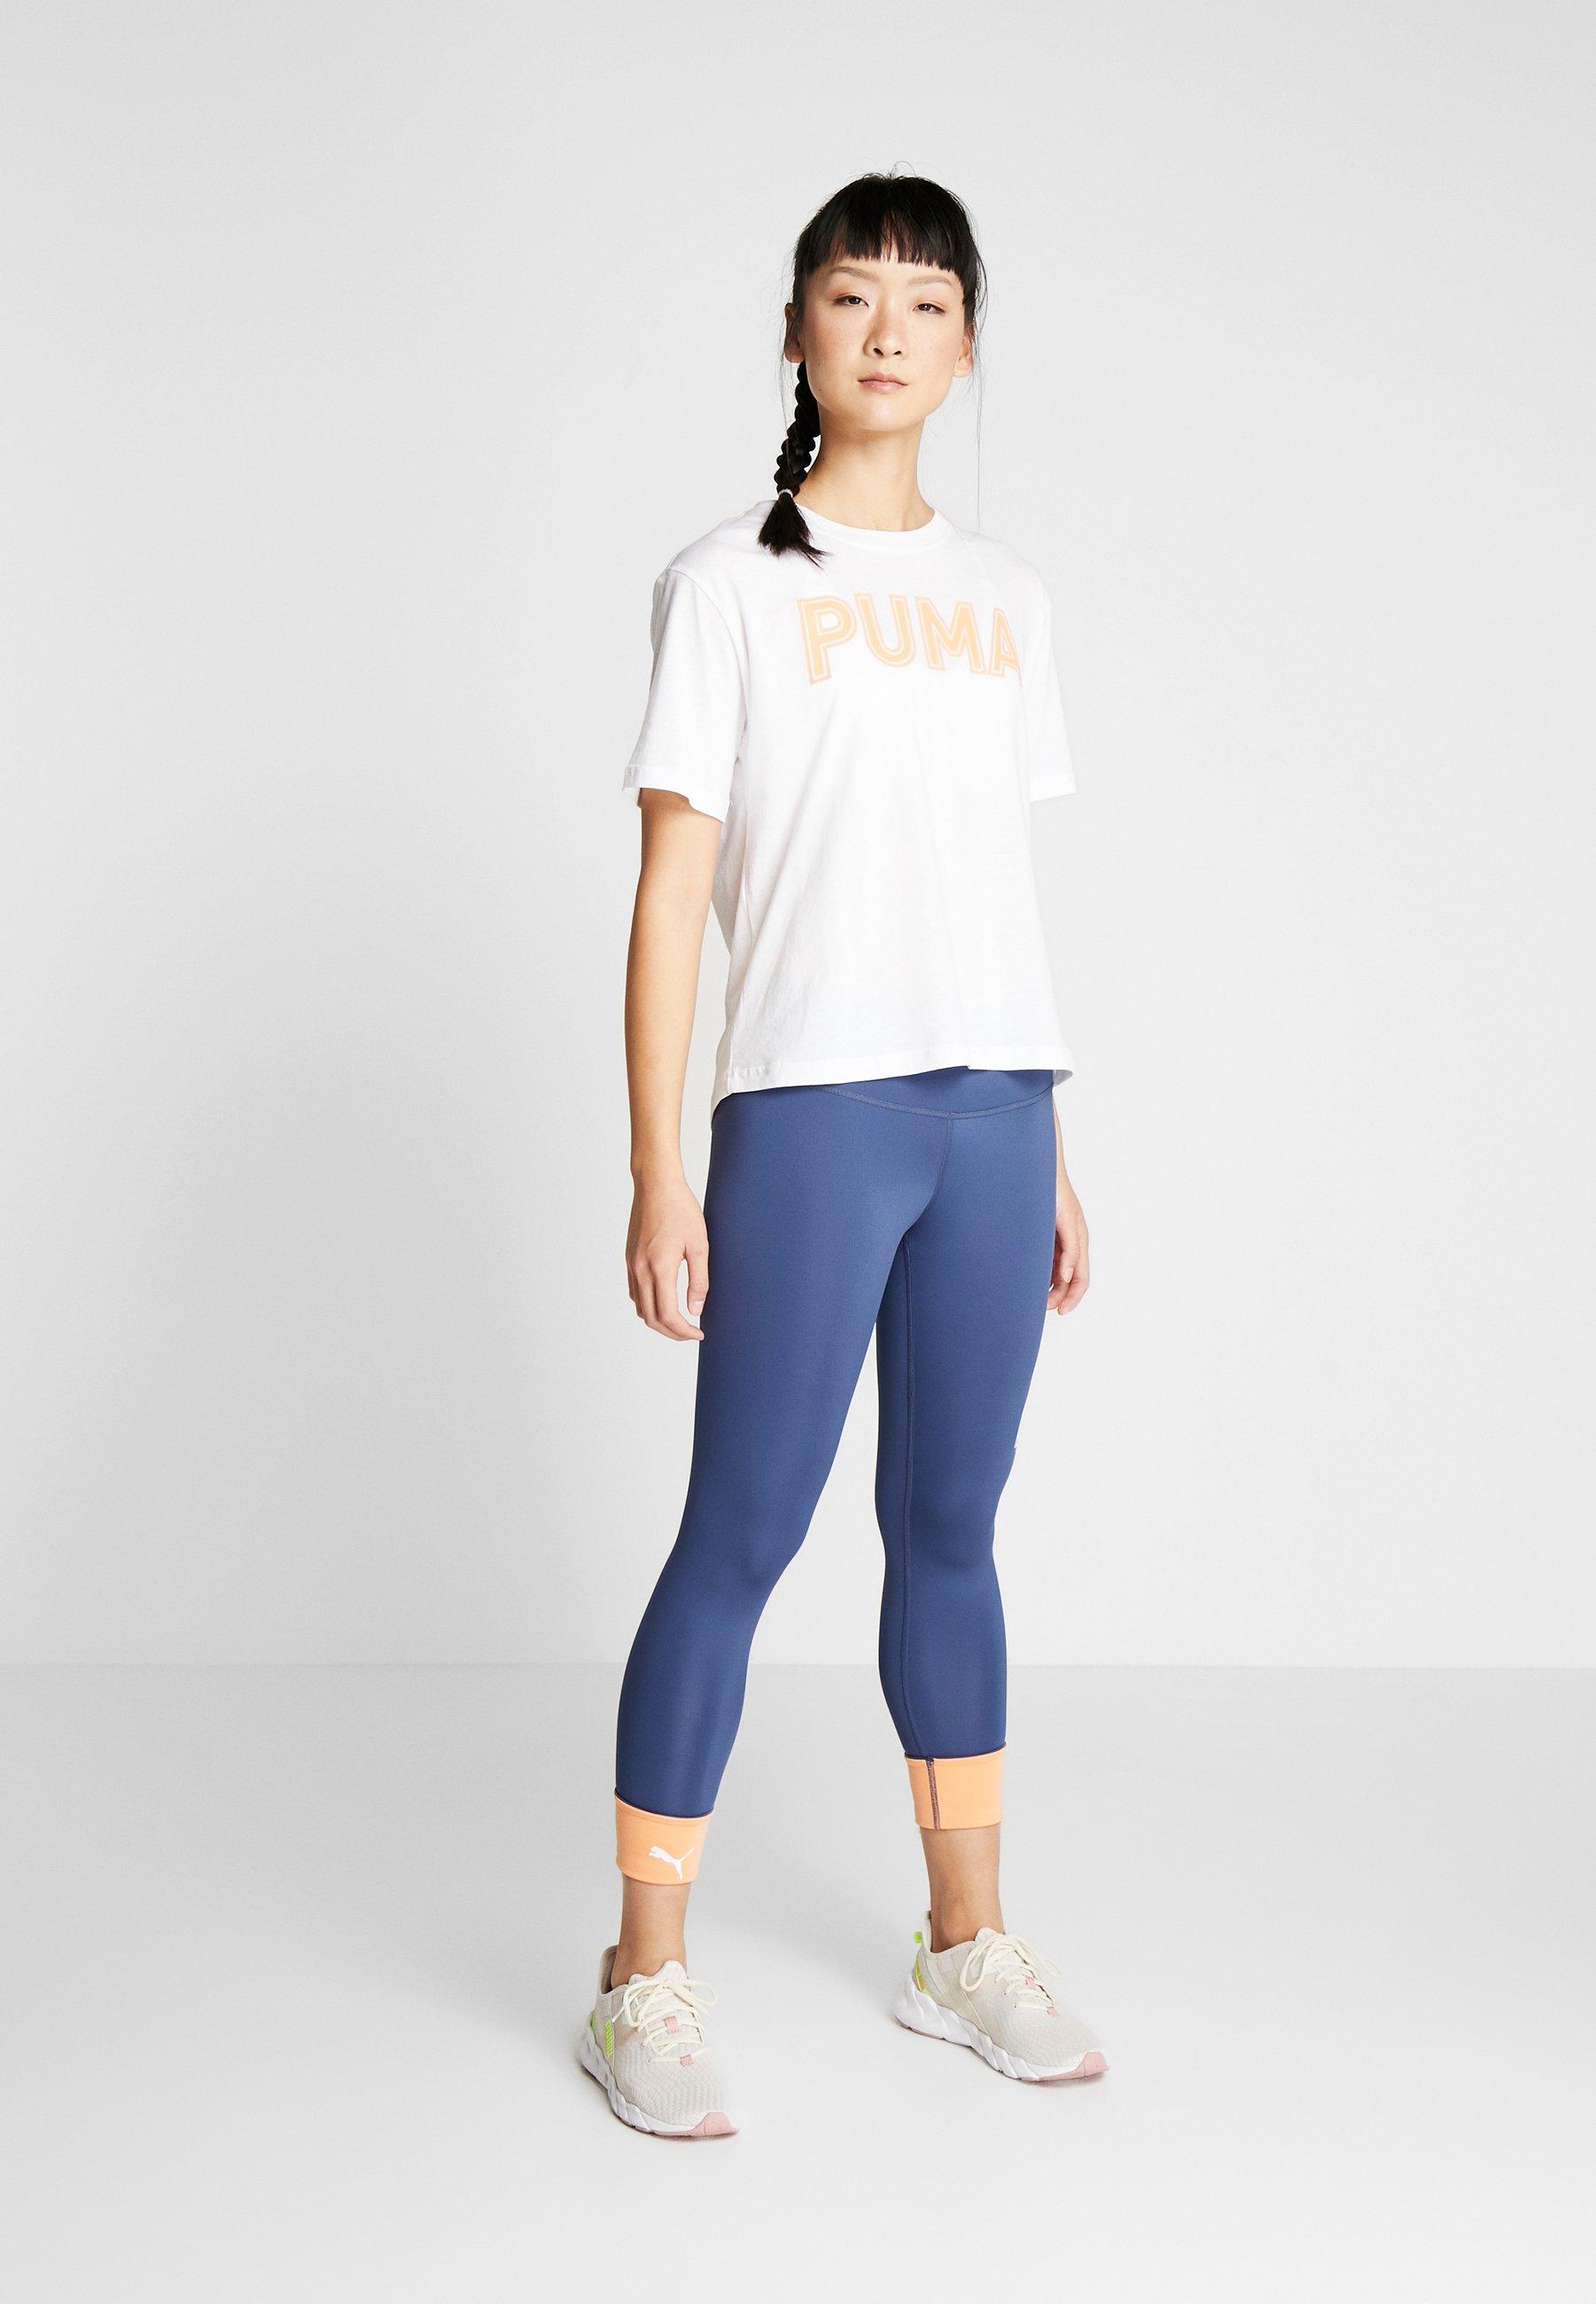 Puma Modern Sports Logo Tee - Print T-shirt White/cantaloupe